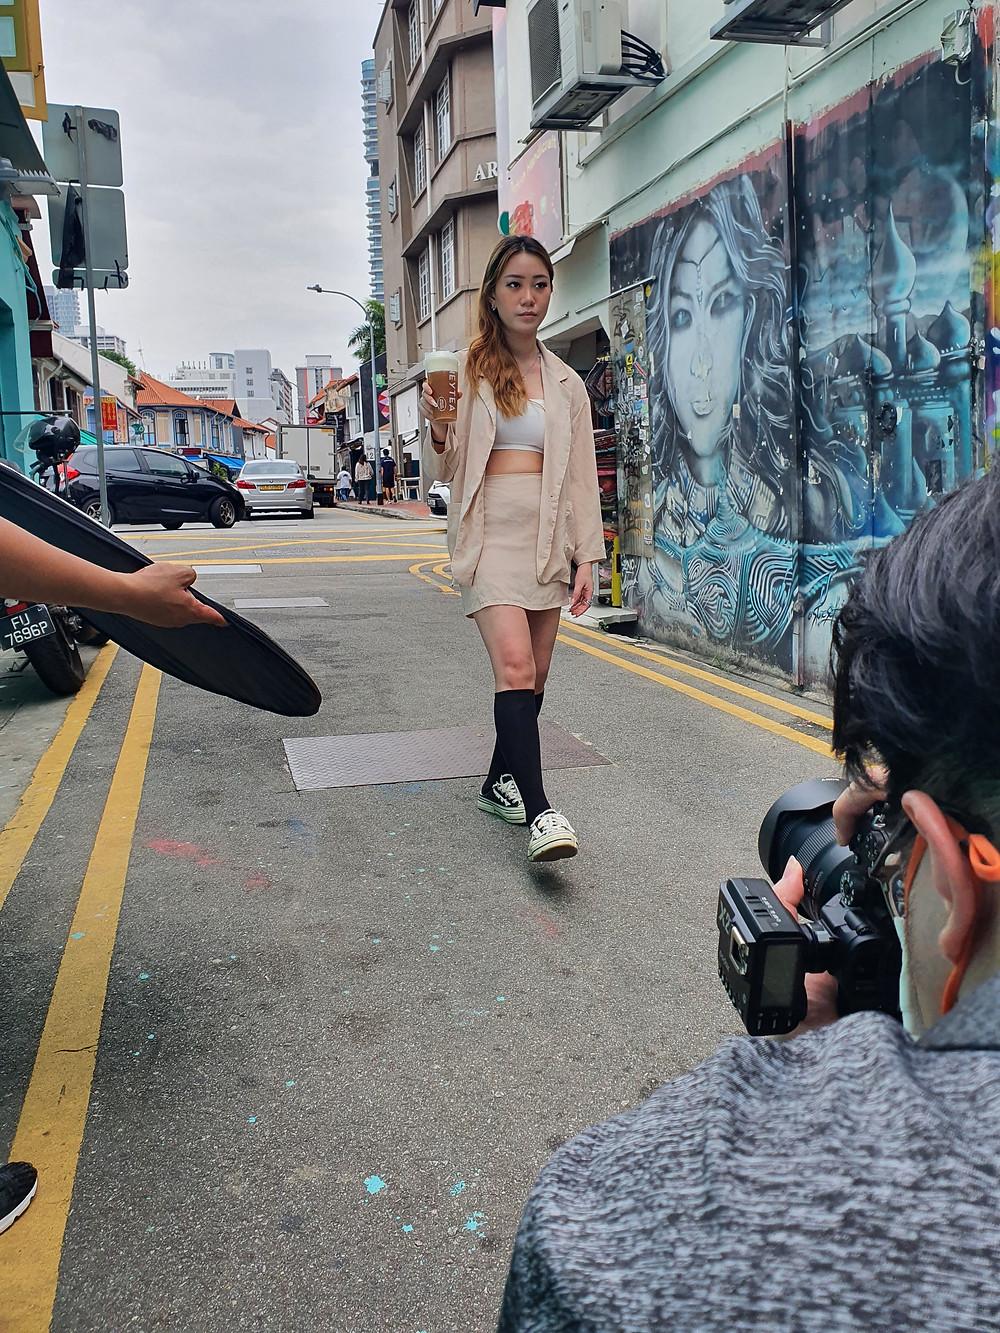 A movement Photoshoot of Rachel with the Hey Tea's King Fone Cheezo